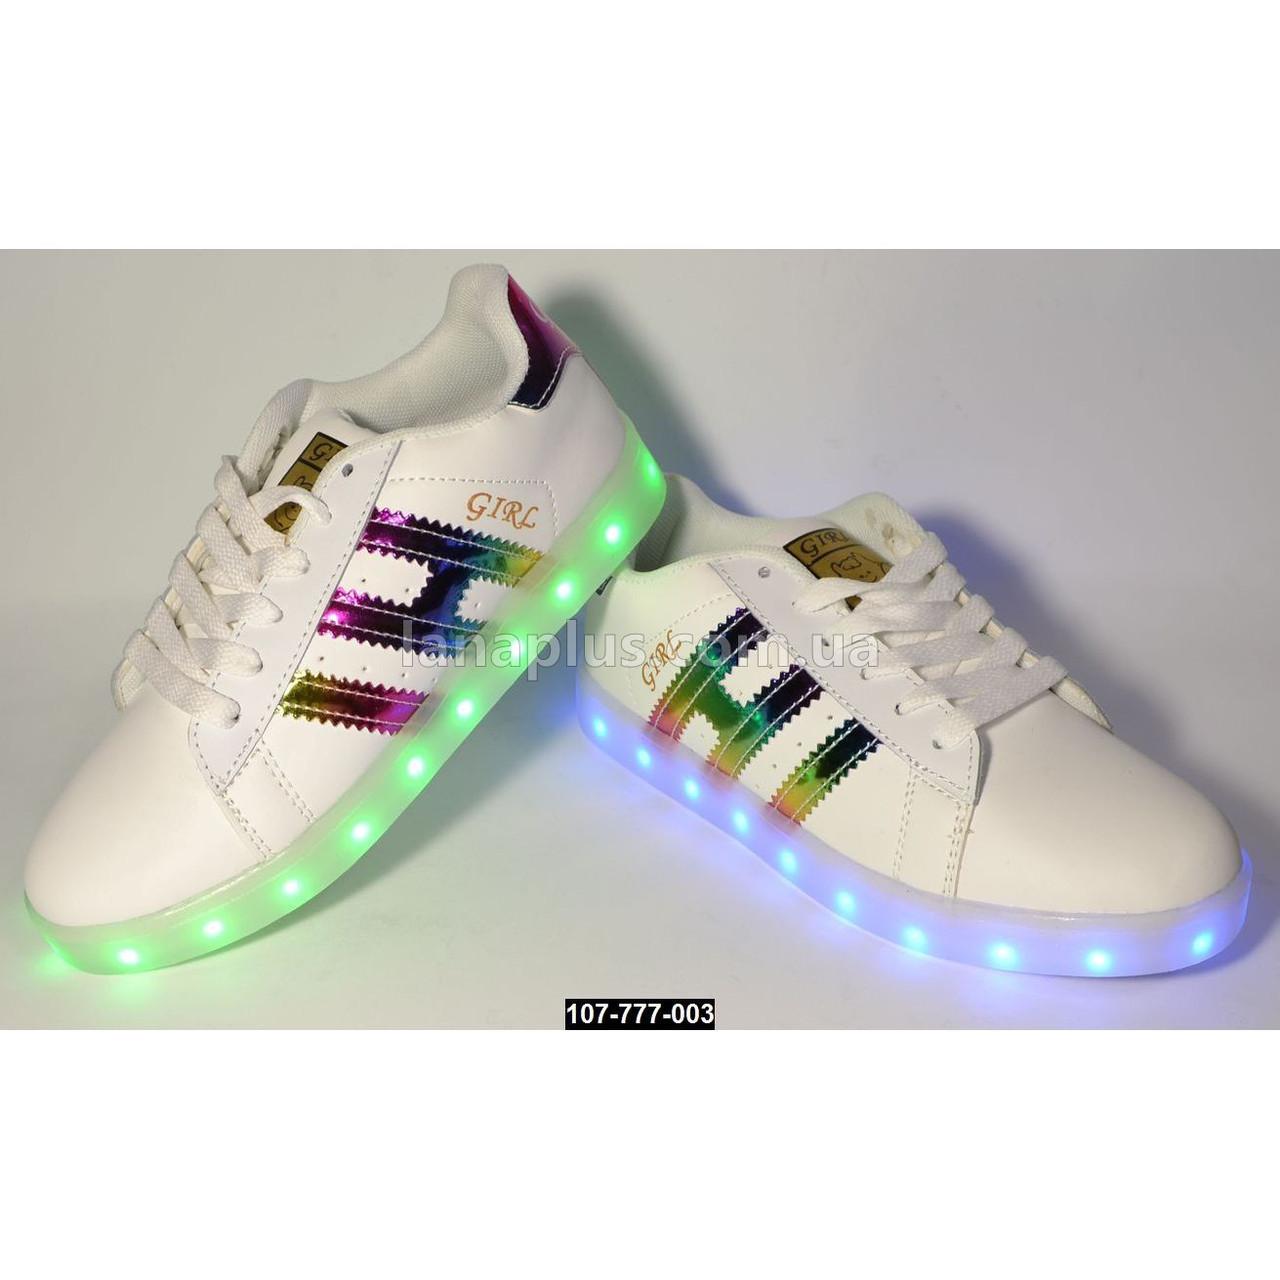 0aafa23bc8975d Светящиеся кроссовки, 40 размер (26 см), 11 режимов LED подсветки, зарядка